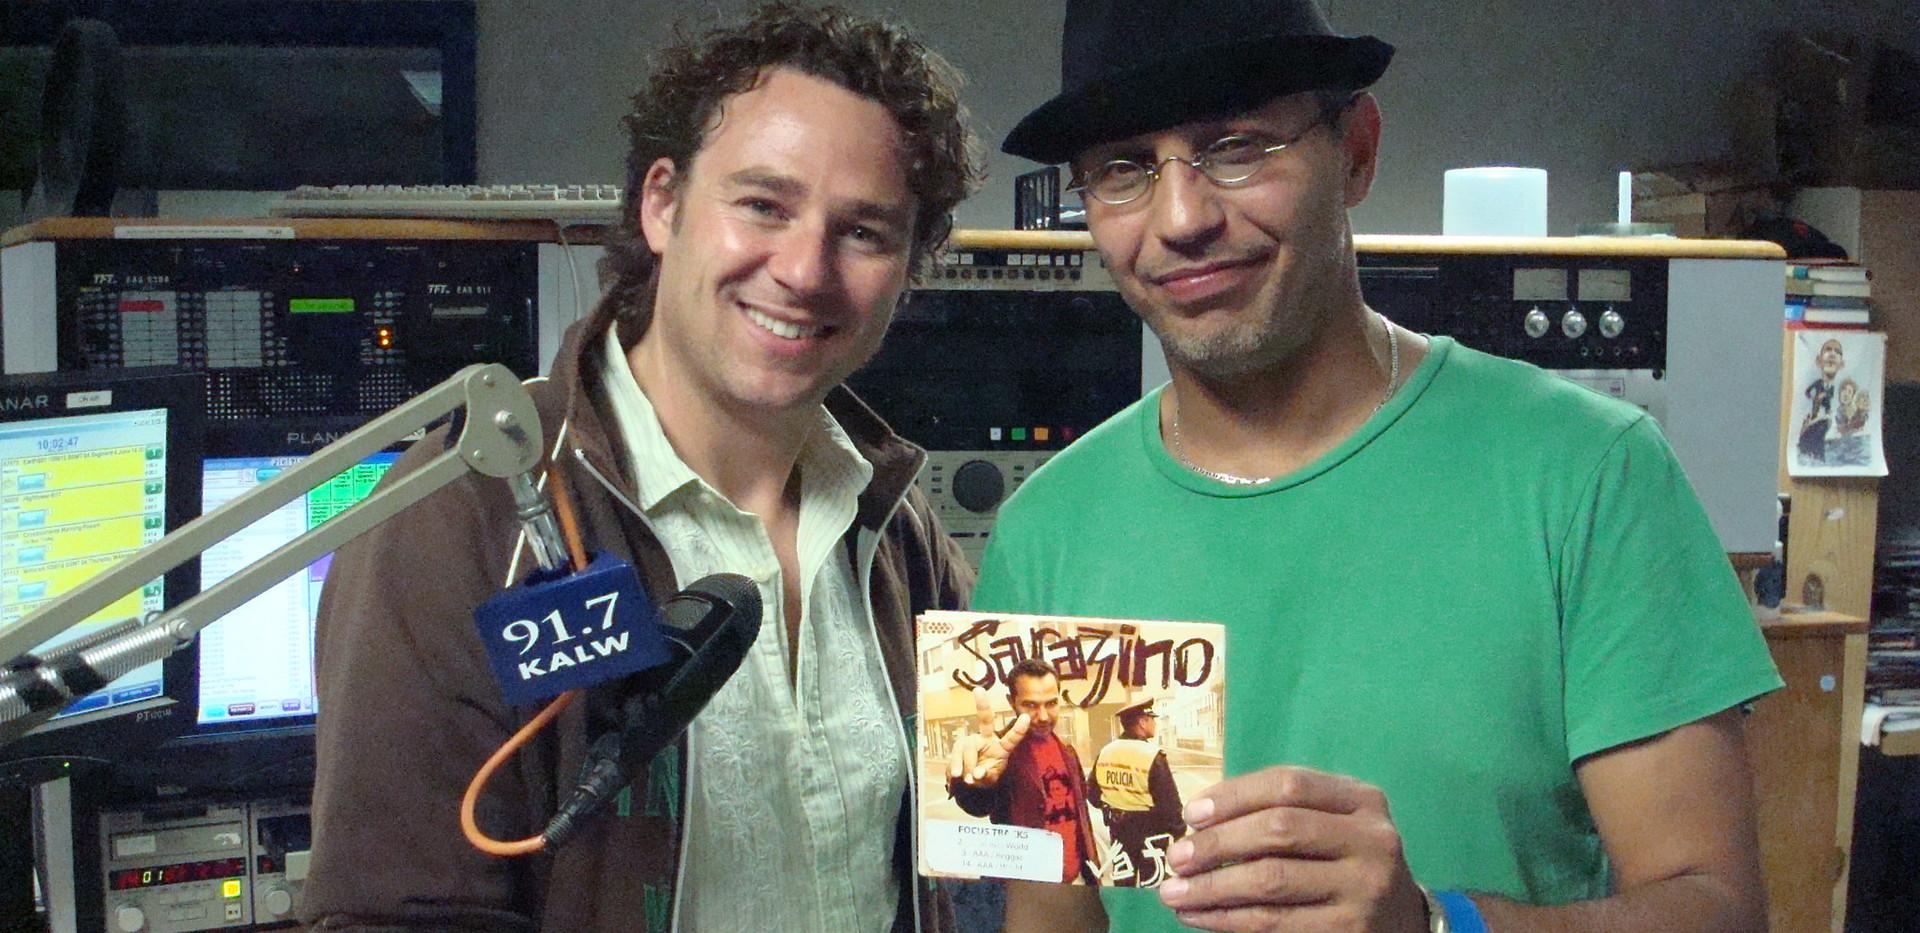 Algerian Afropop singer Sarazino  and Jacob Edgar of Cumbancha records guest on Africamix.